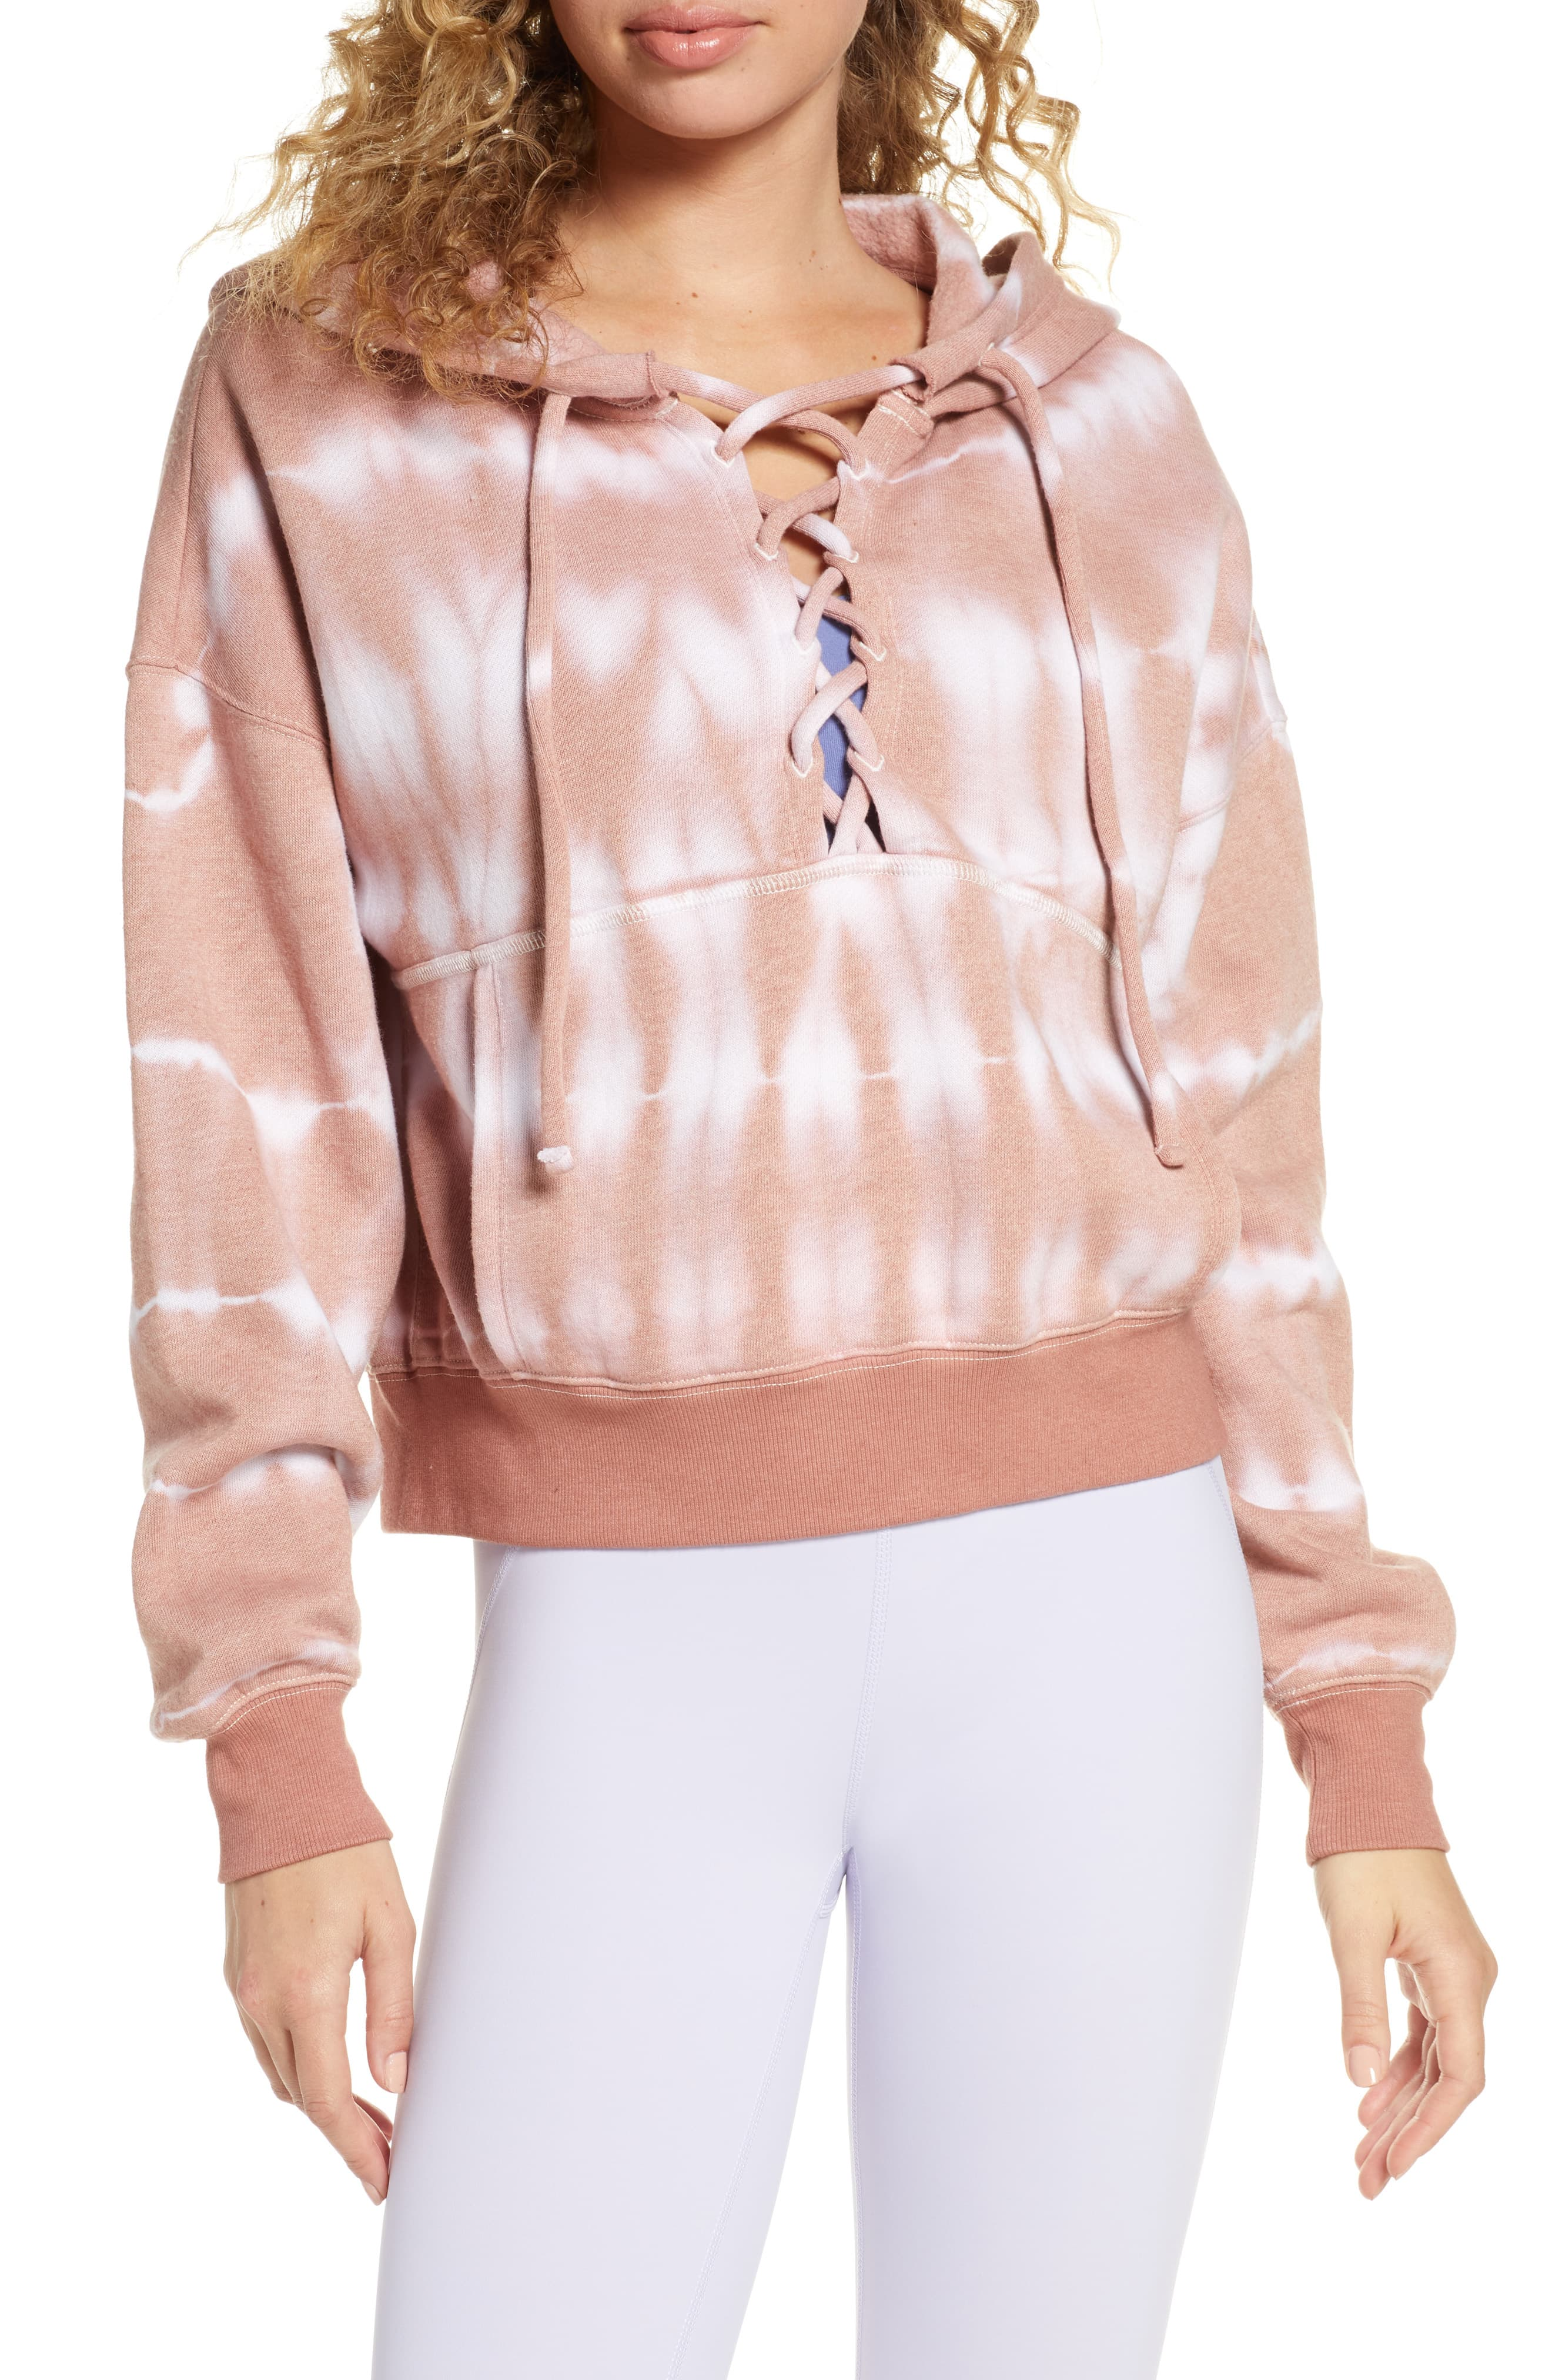 Pin By Mj Kim On Outfits Hoodies Tie Dye Tie Dye Sweater [ 4048 x 2640 Pixel ]